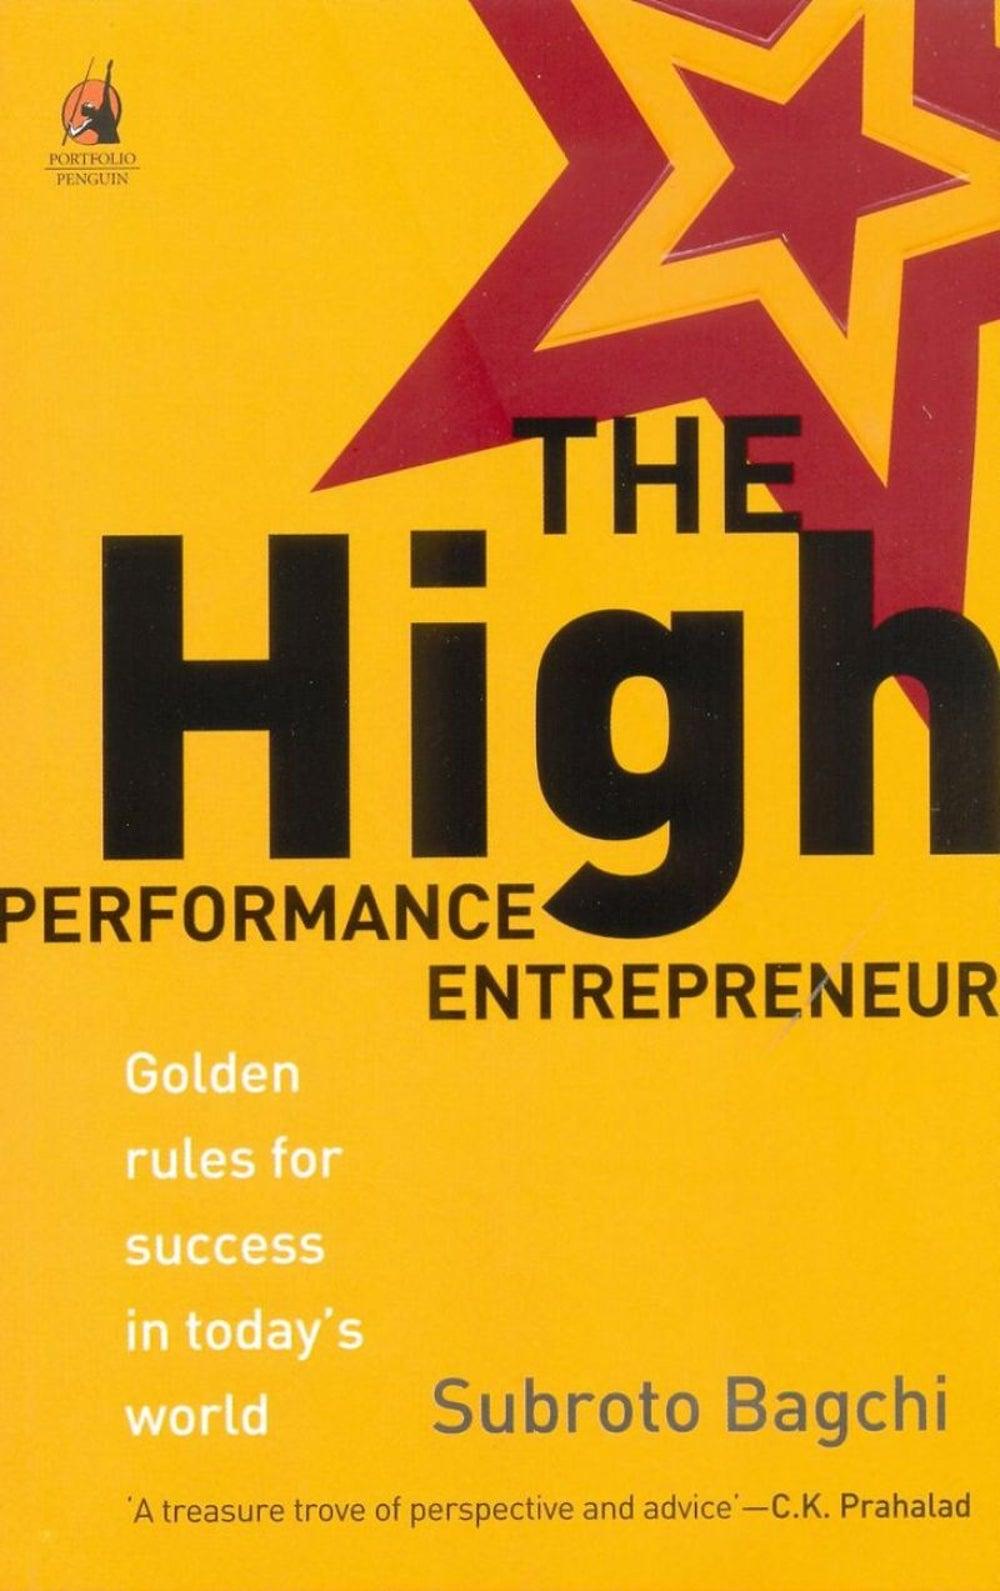 THE HIGH PERFORMANCE ENTREPRENEUR by Subroto Bagc